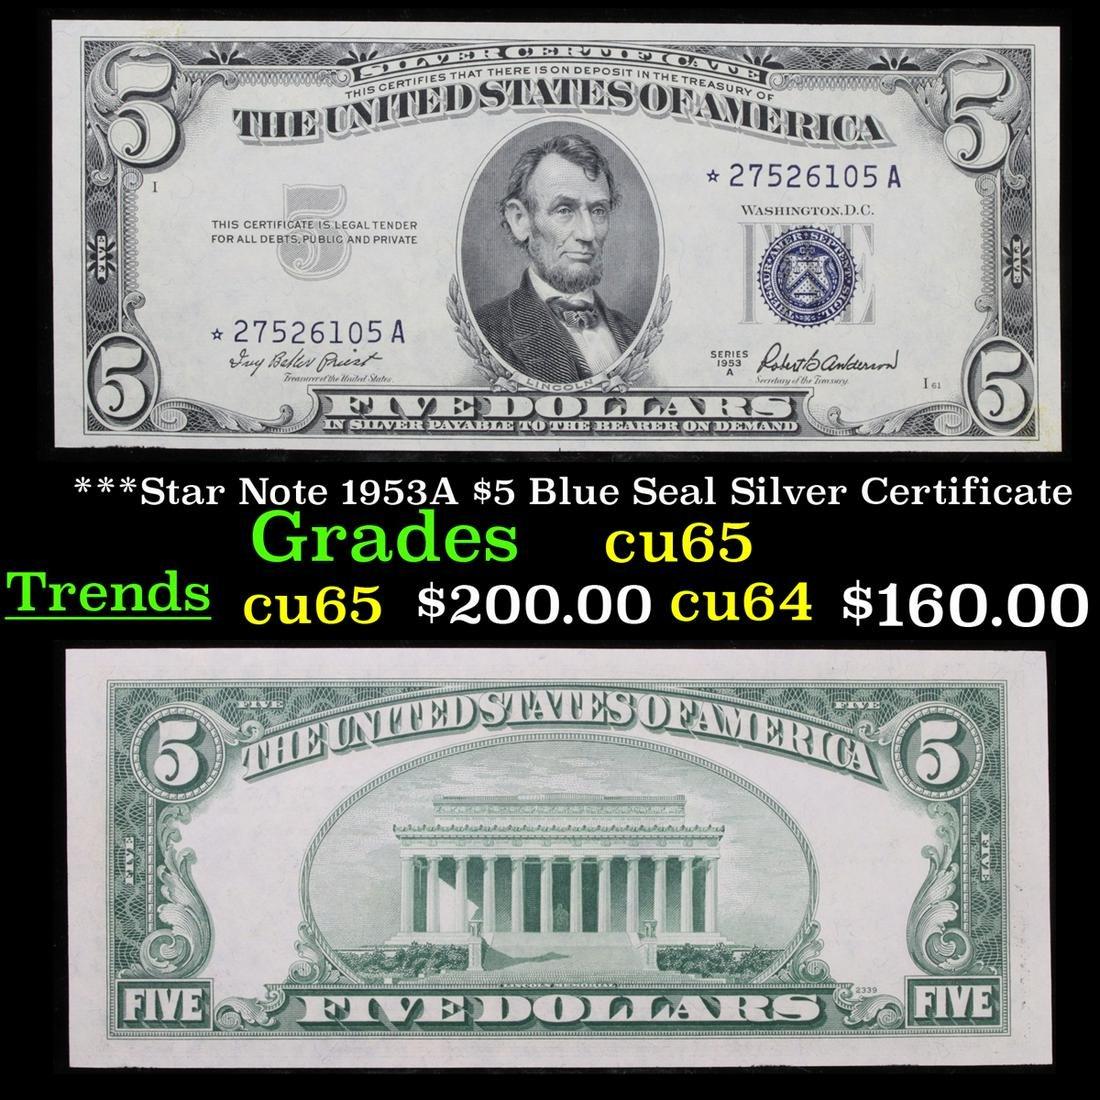 ***Star Note 1953A $5 Blue Seal Silver Certificate